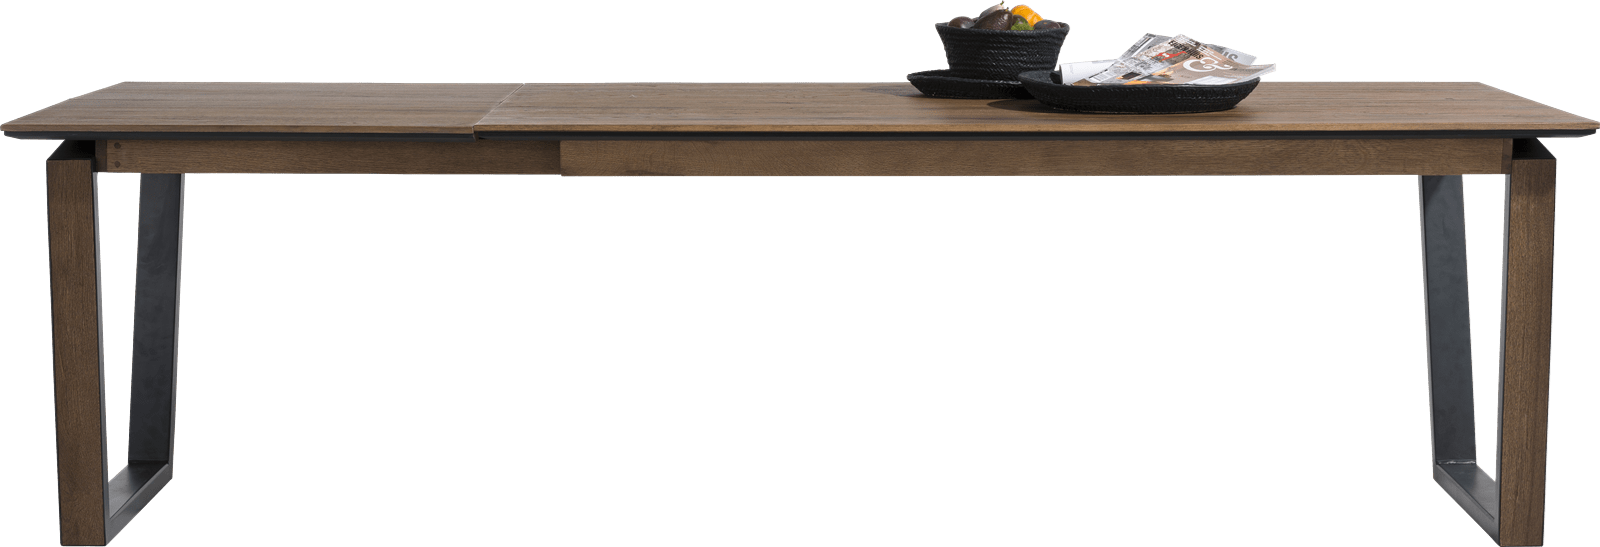 Livada - uitschuiftafel 190 (+ 80) x 100 cm